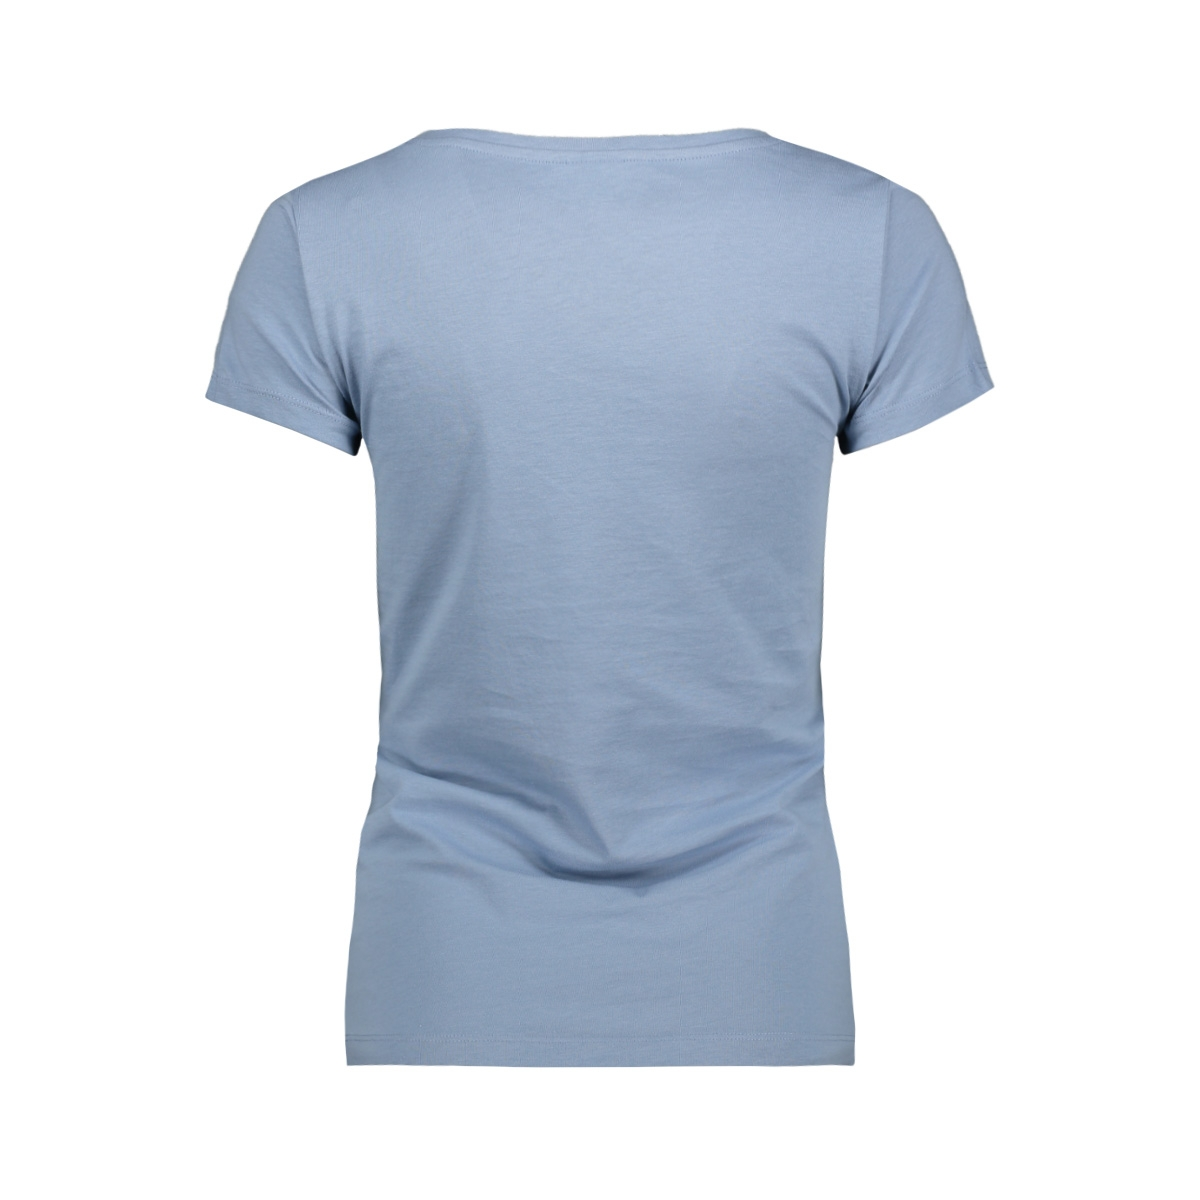 jdychicago life s/s print top jrs 15195298 jacqueline de yong t-shirt faded denim/things